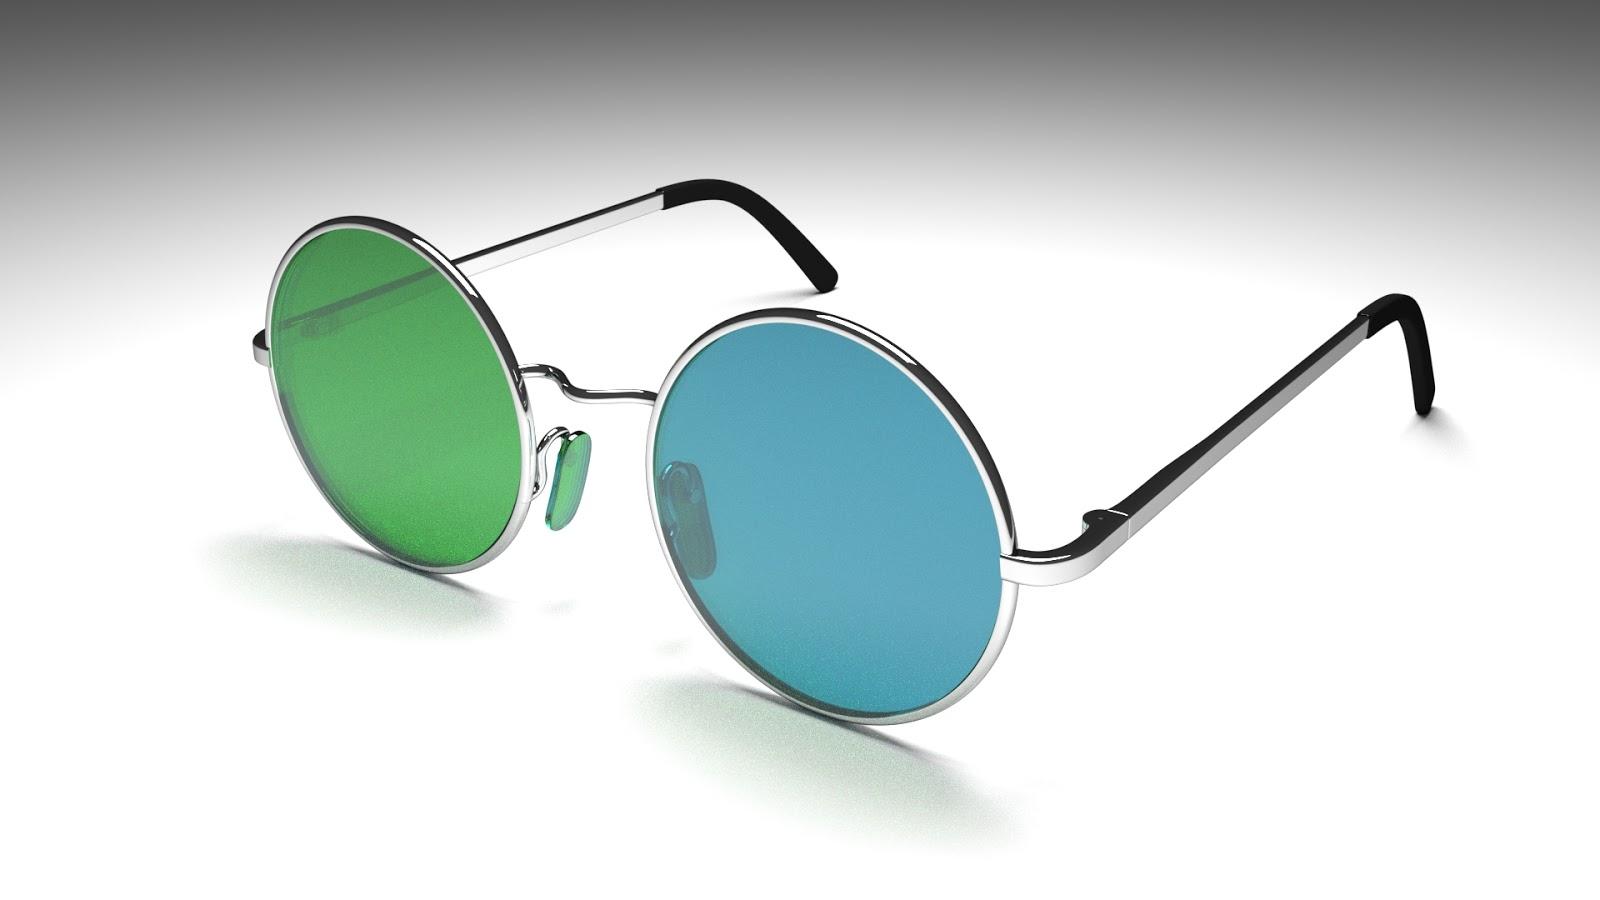 Free 3D Retro Sunglasses .blend file